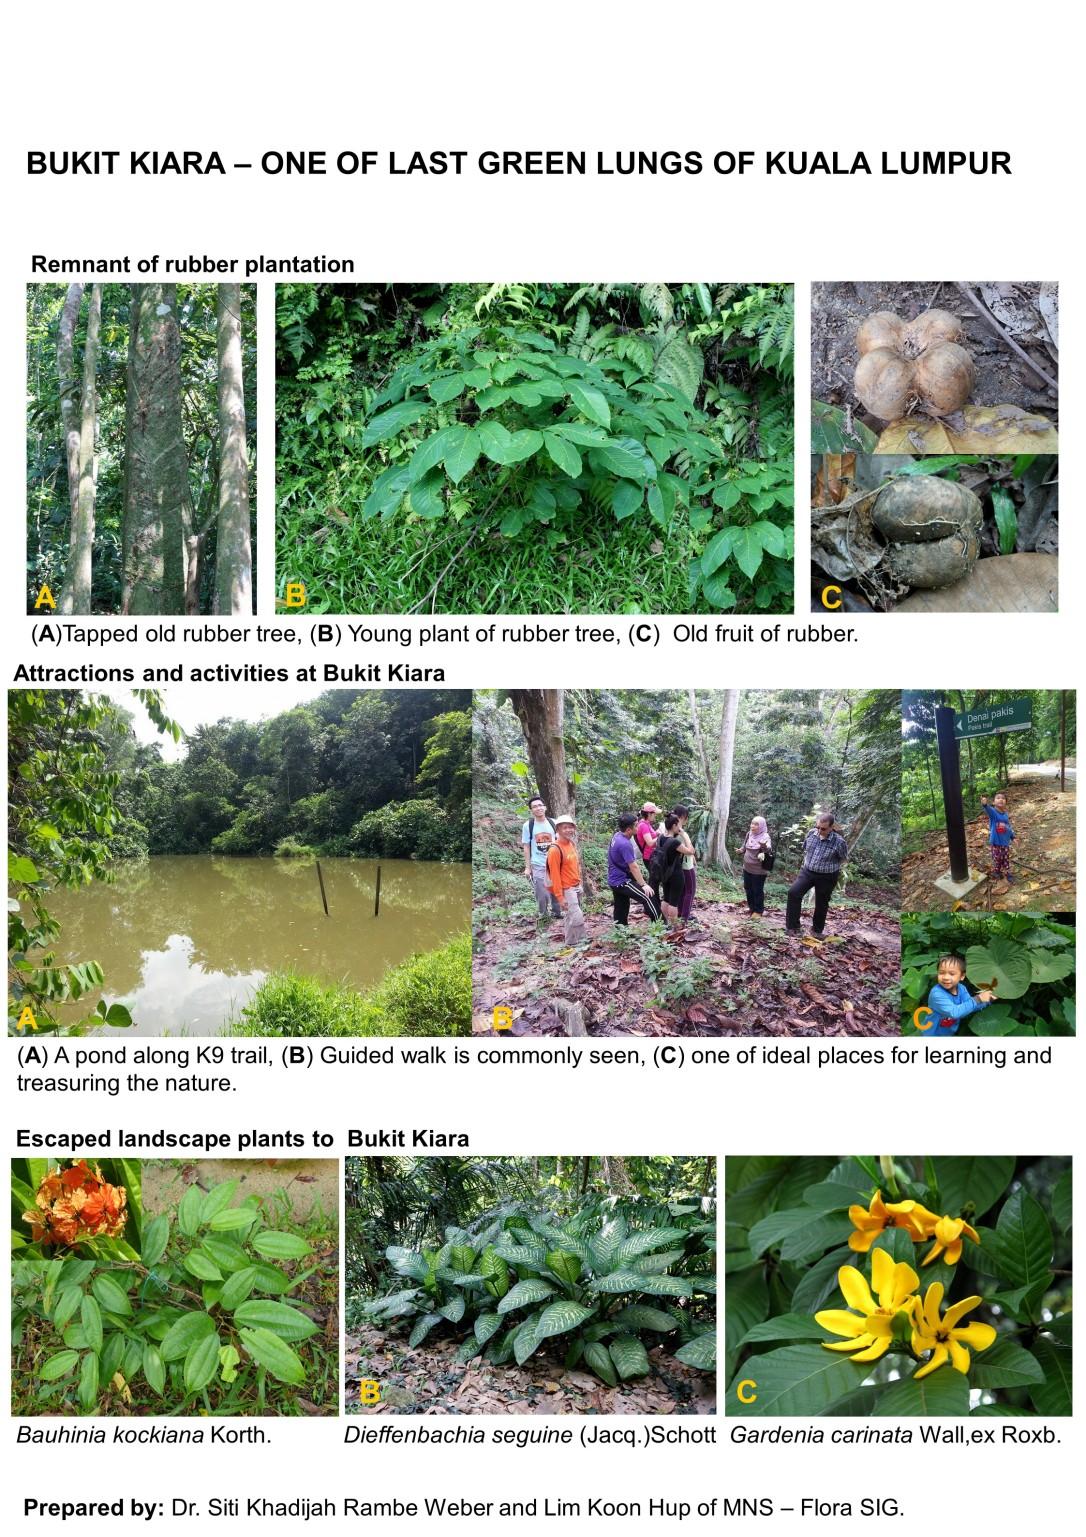 Earthday Bukit Kiara-GREEN LUNG